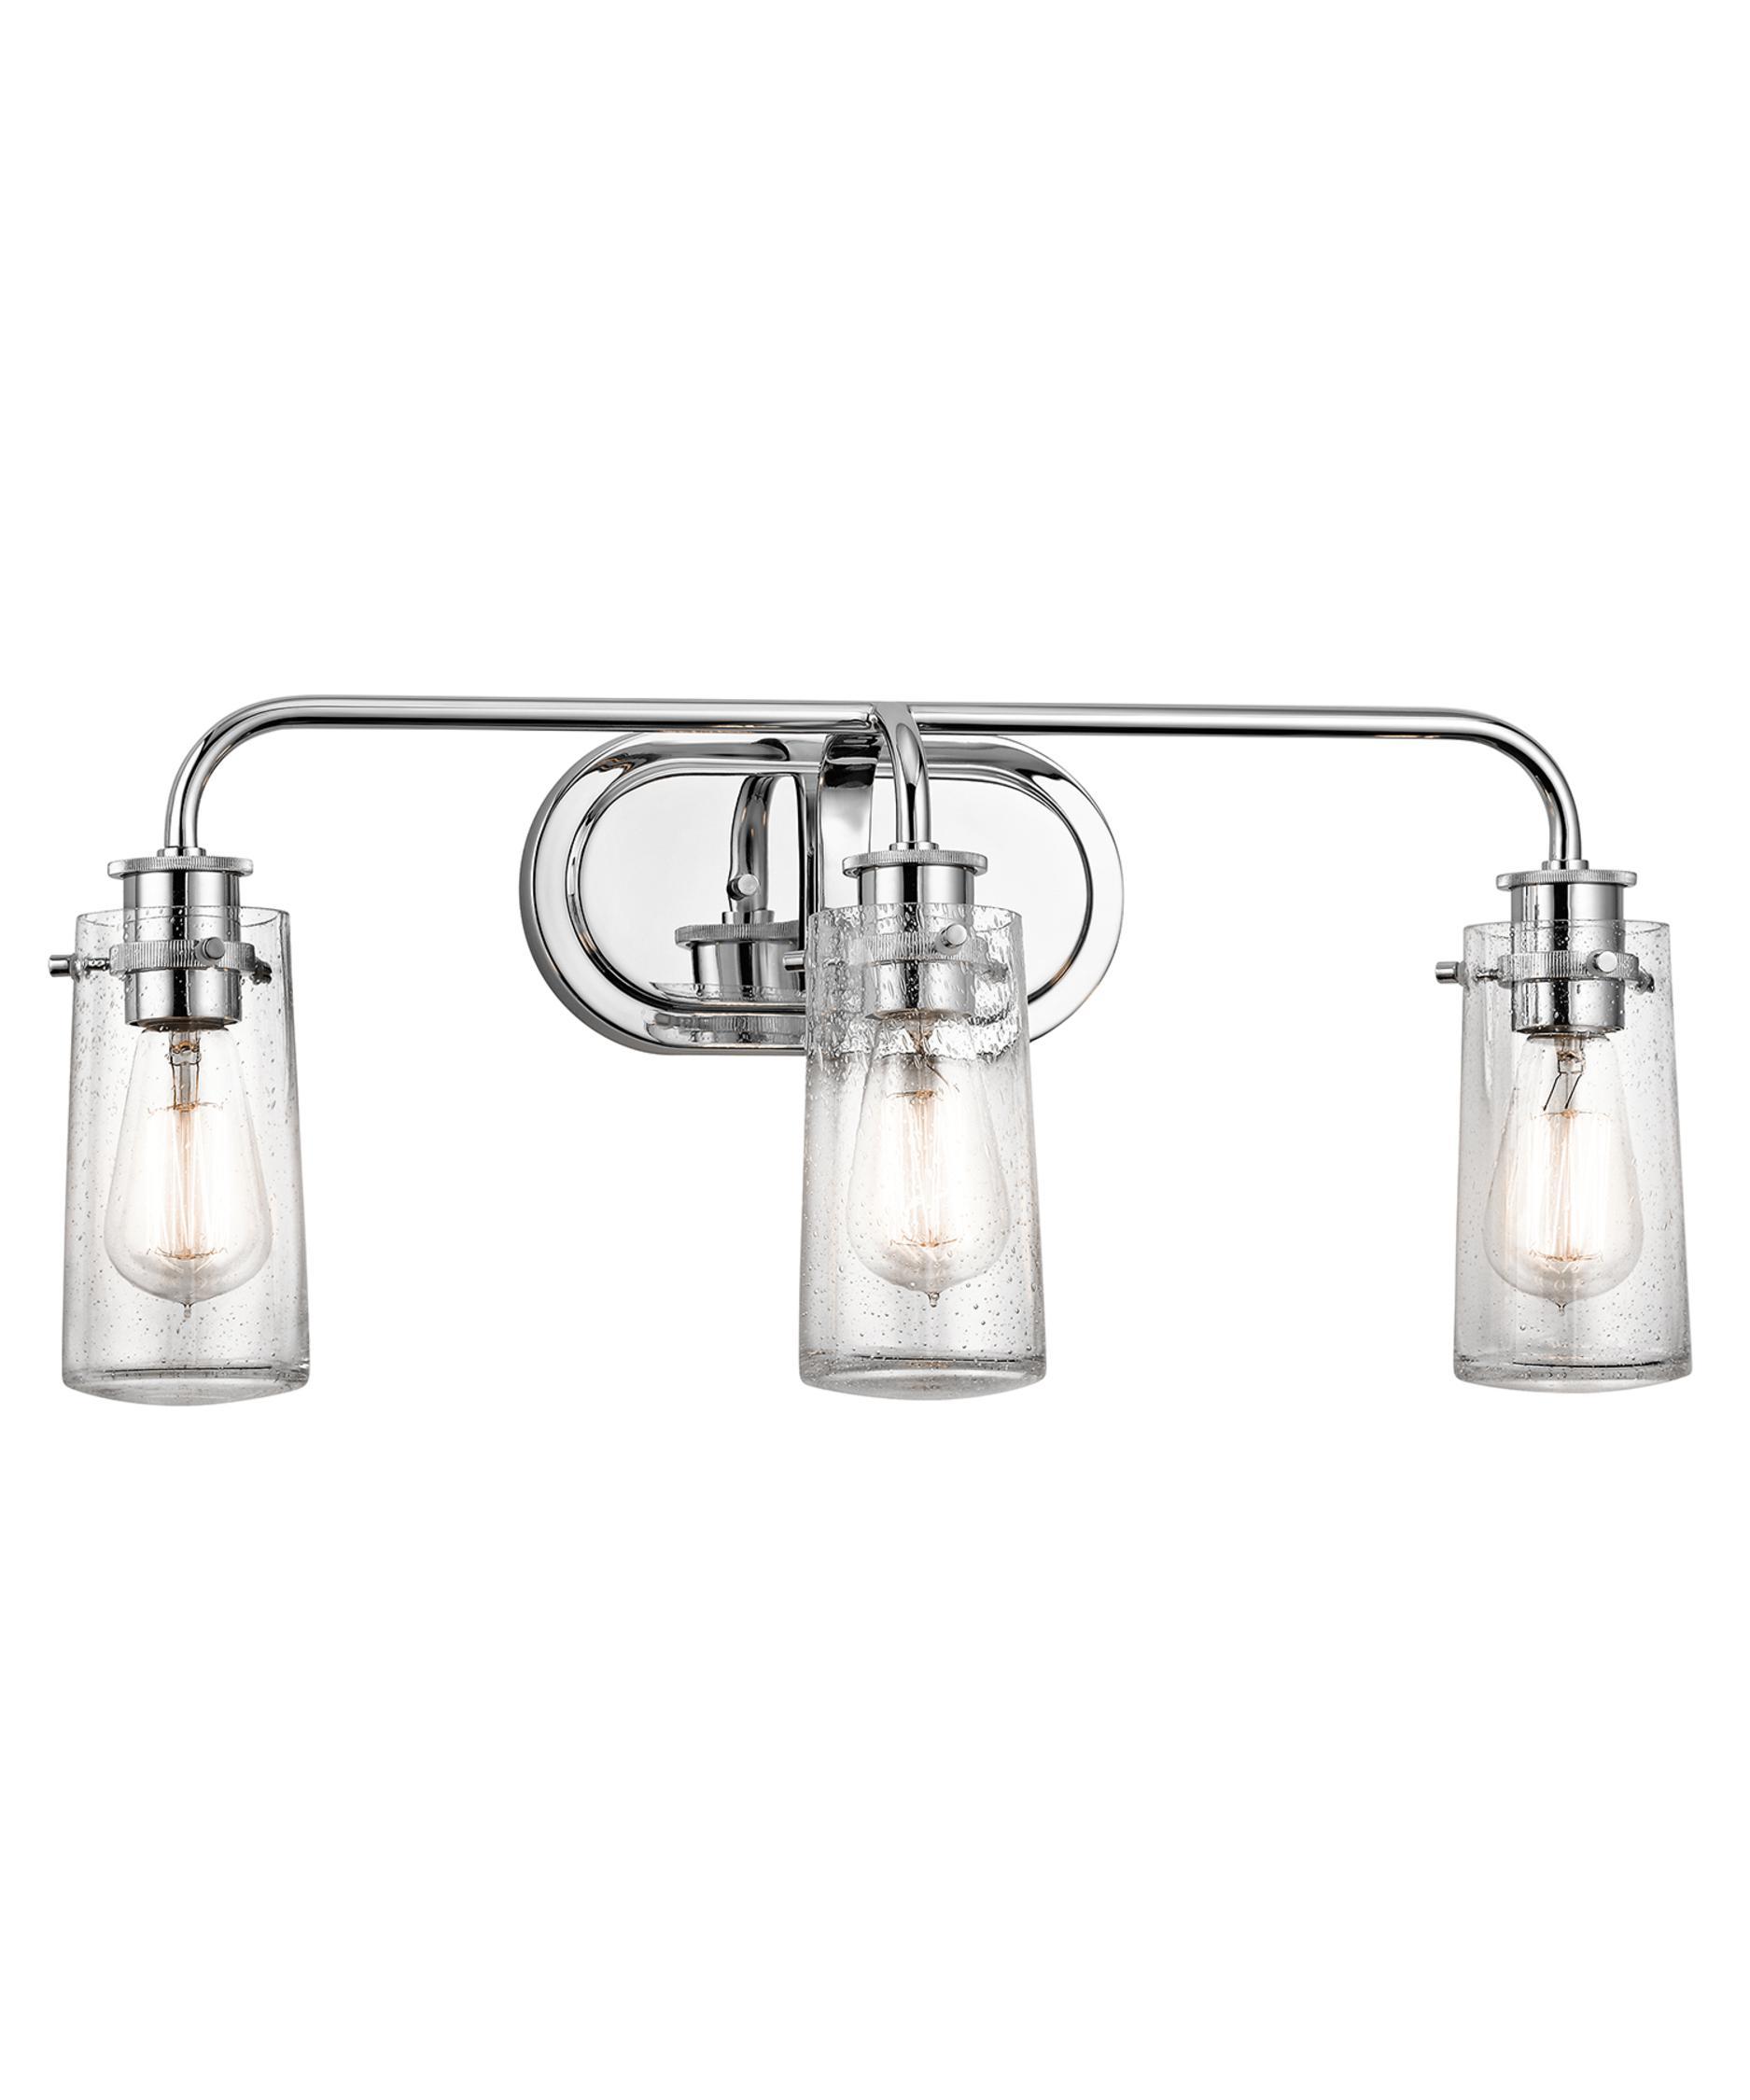 Bathroom Vanity Lights Chrome Finish kichler 45459 braelyn 24 inch wide bath vanity light | capitol